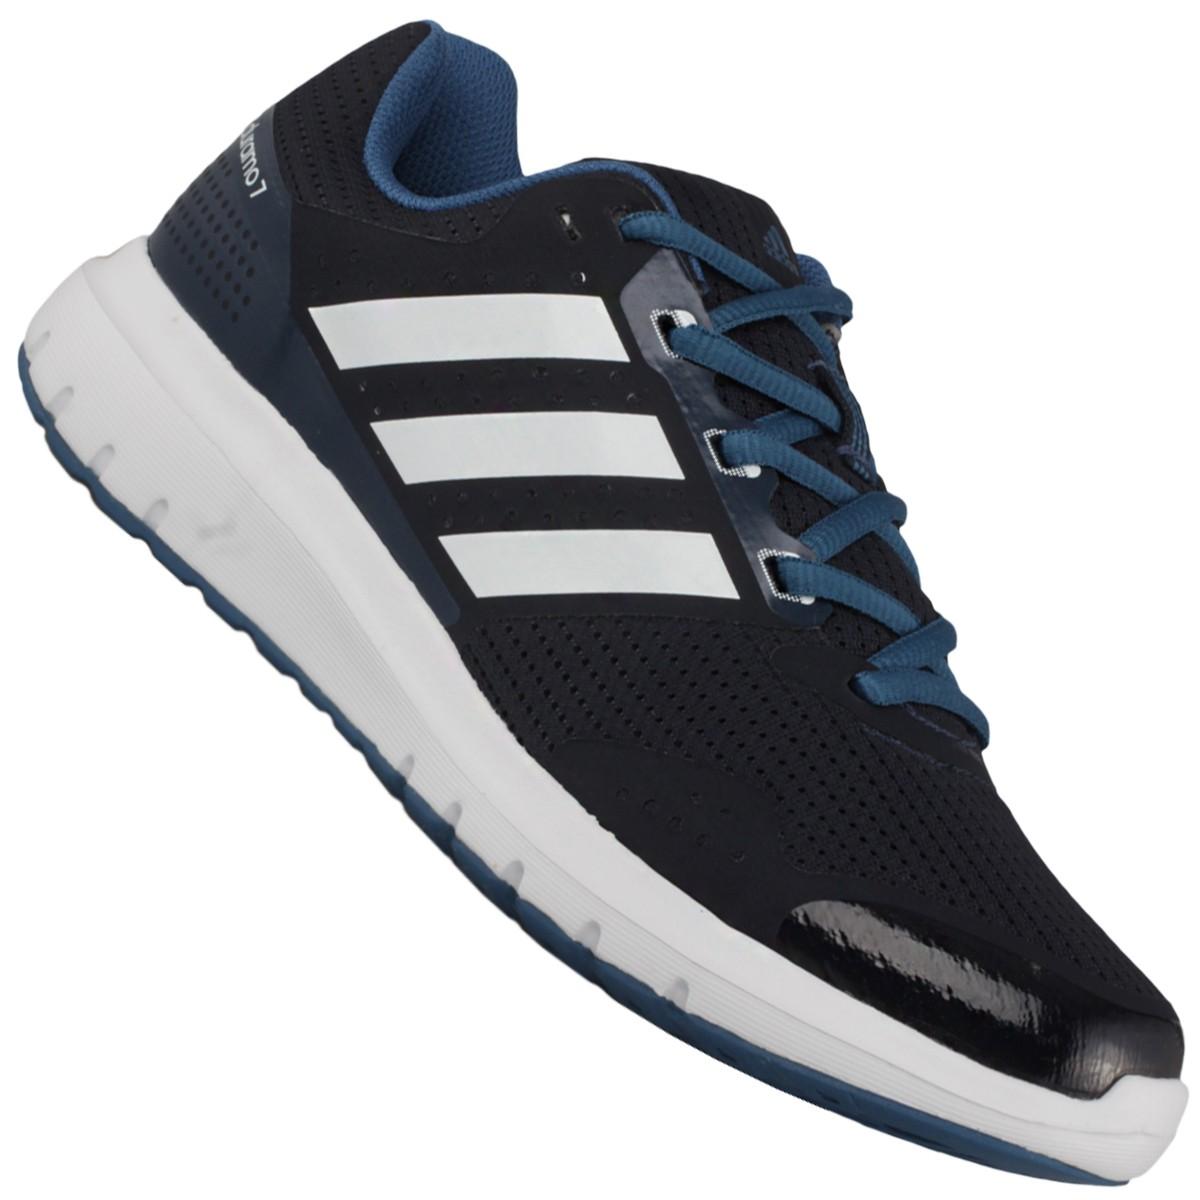 e9125f87422 Tênis Adidas Duramo 7 Feminino